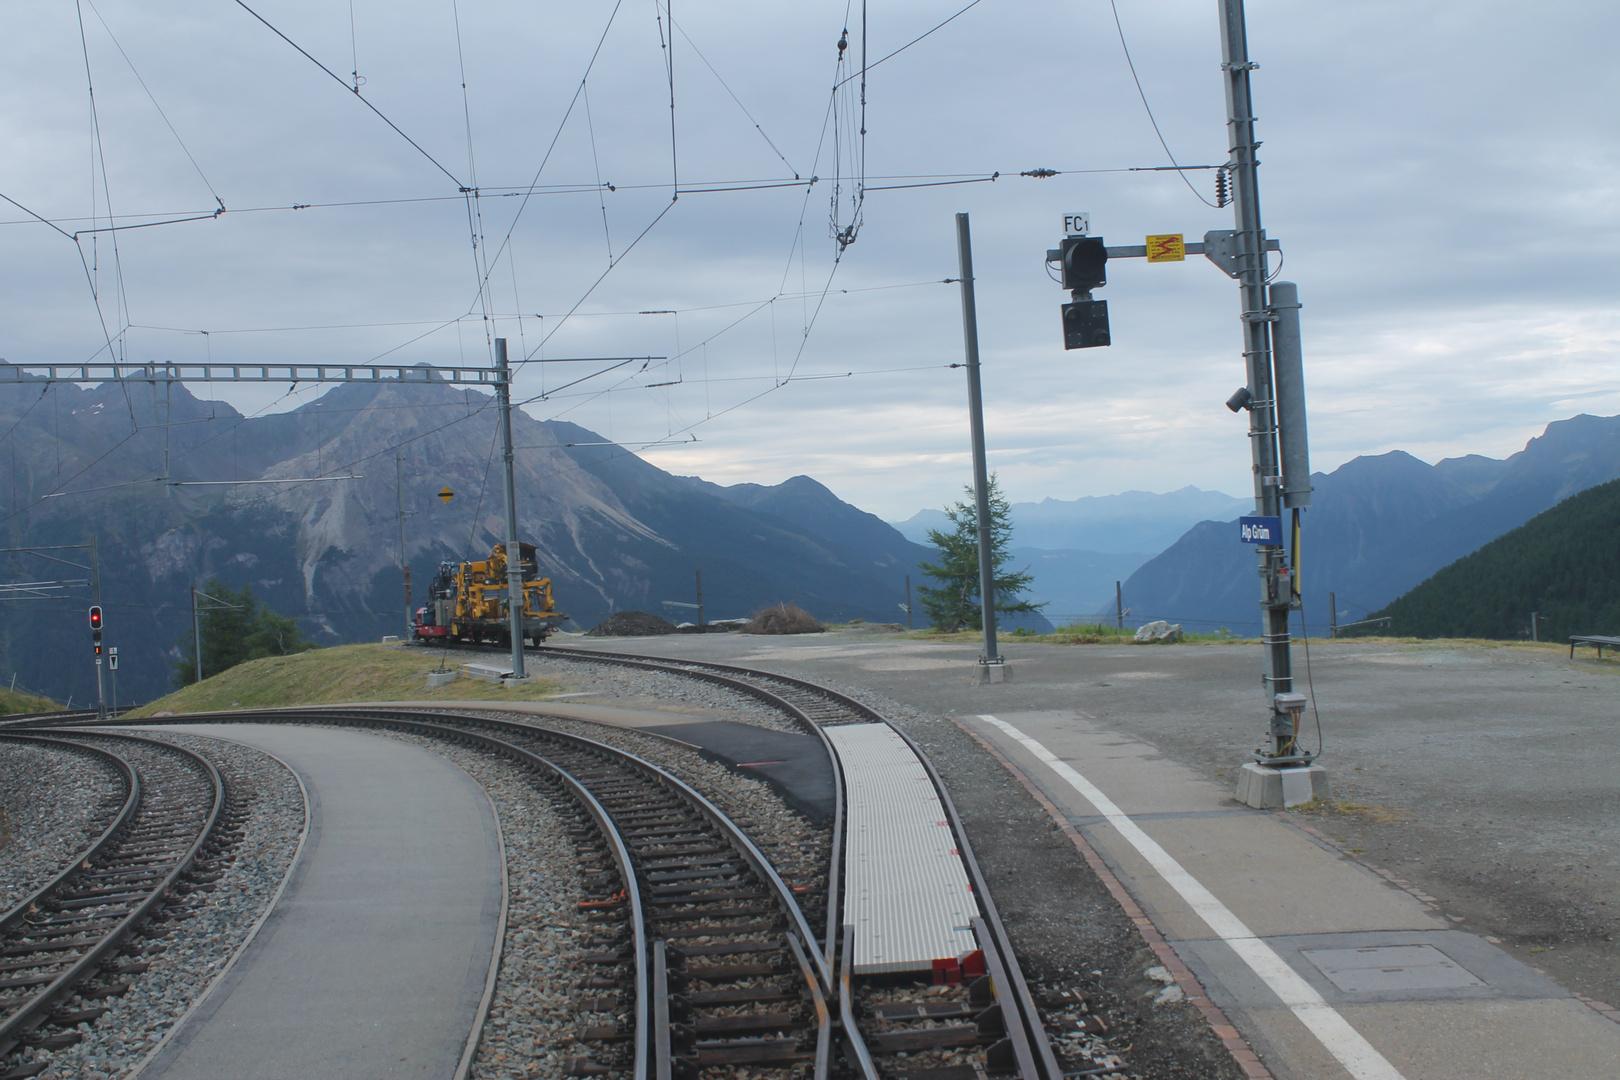 a glance at Bermina railway